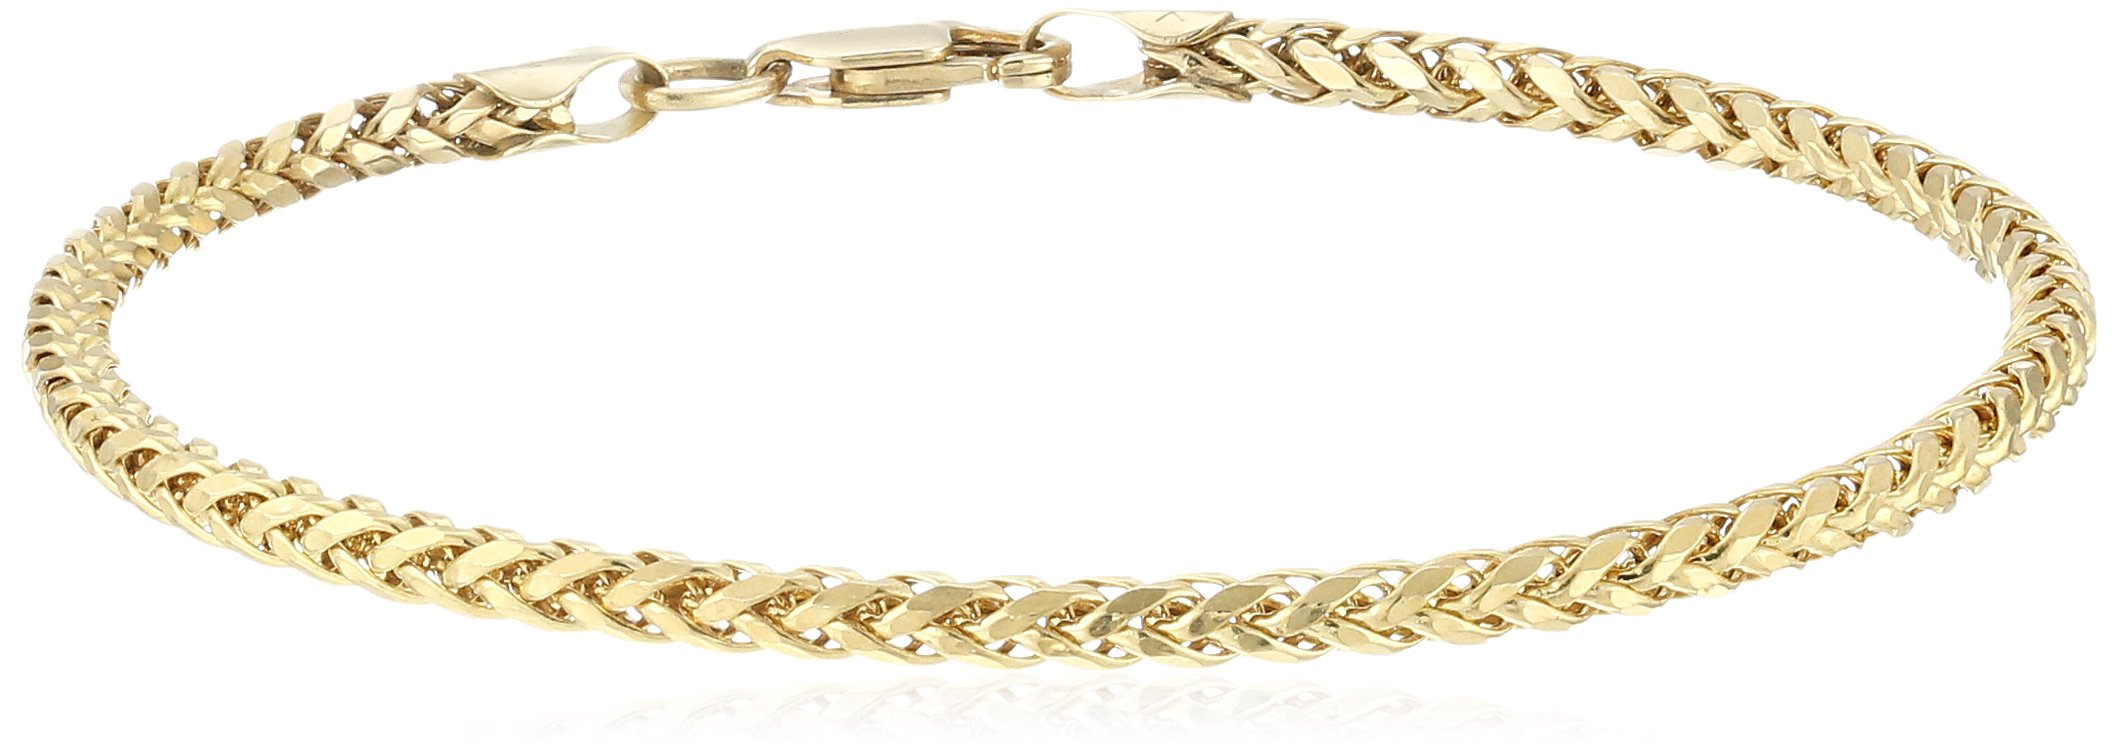 14k Yellow Gold 2.5mm Hollow Wheat Chain Bracelet, 7.5''